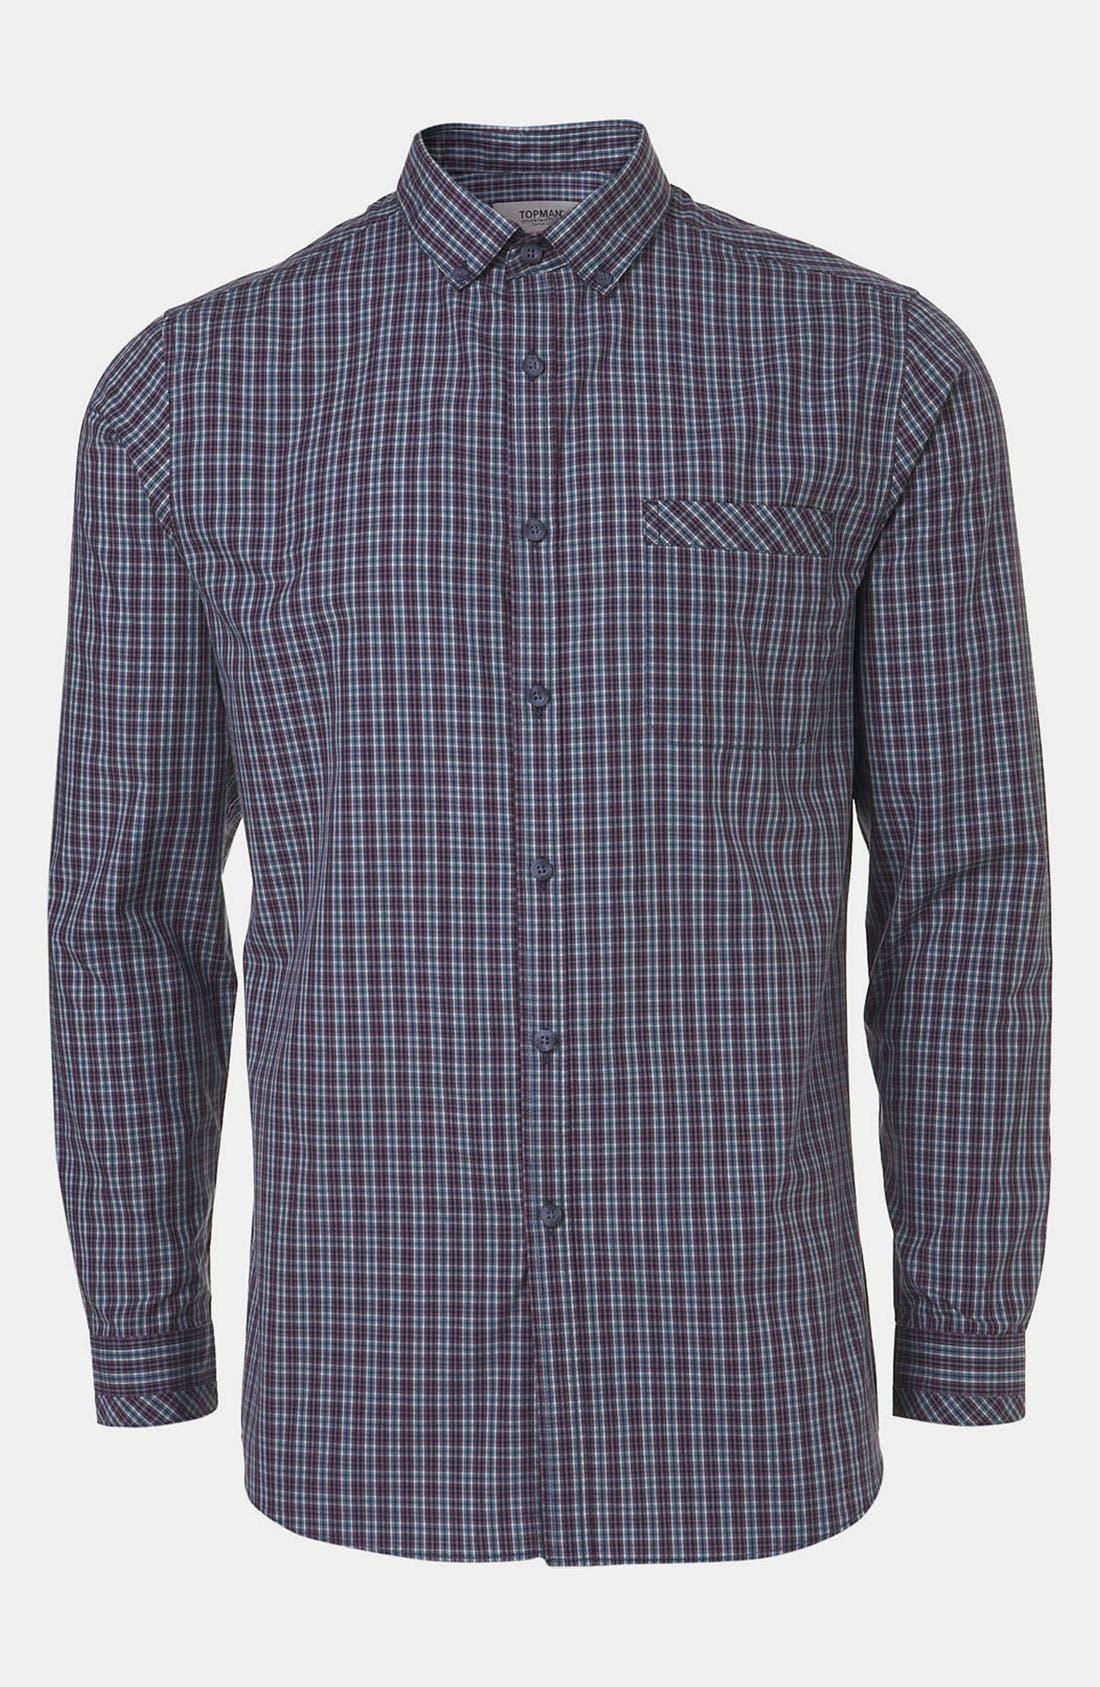 Alternate Image 1 Selected - Topman Extra Trim Tartan Check Shirt